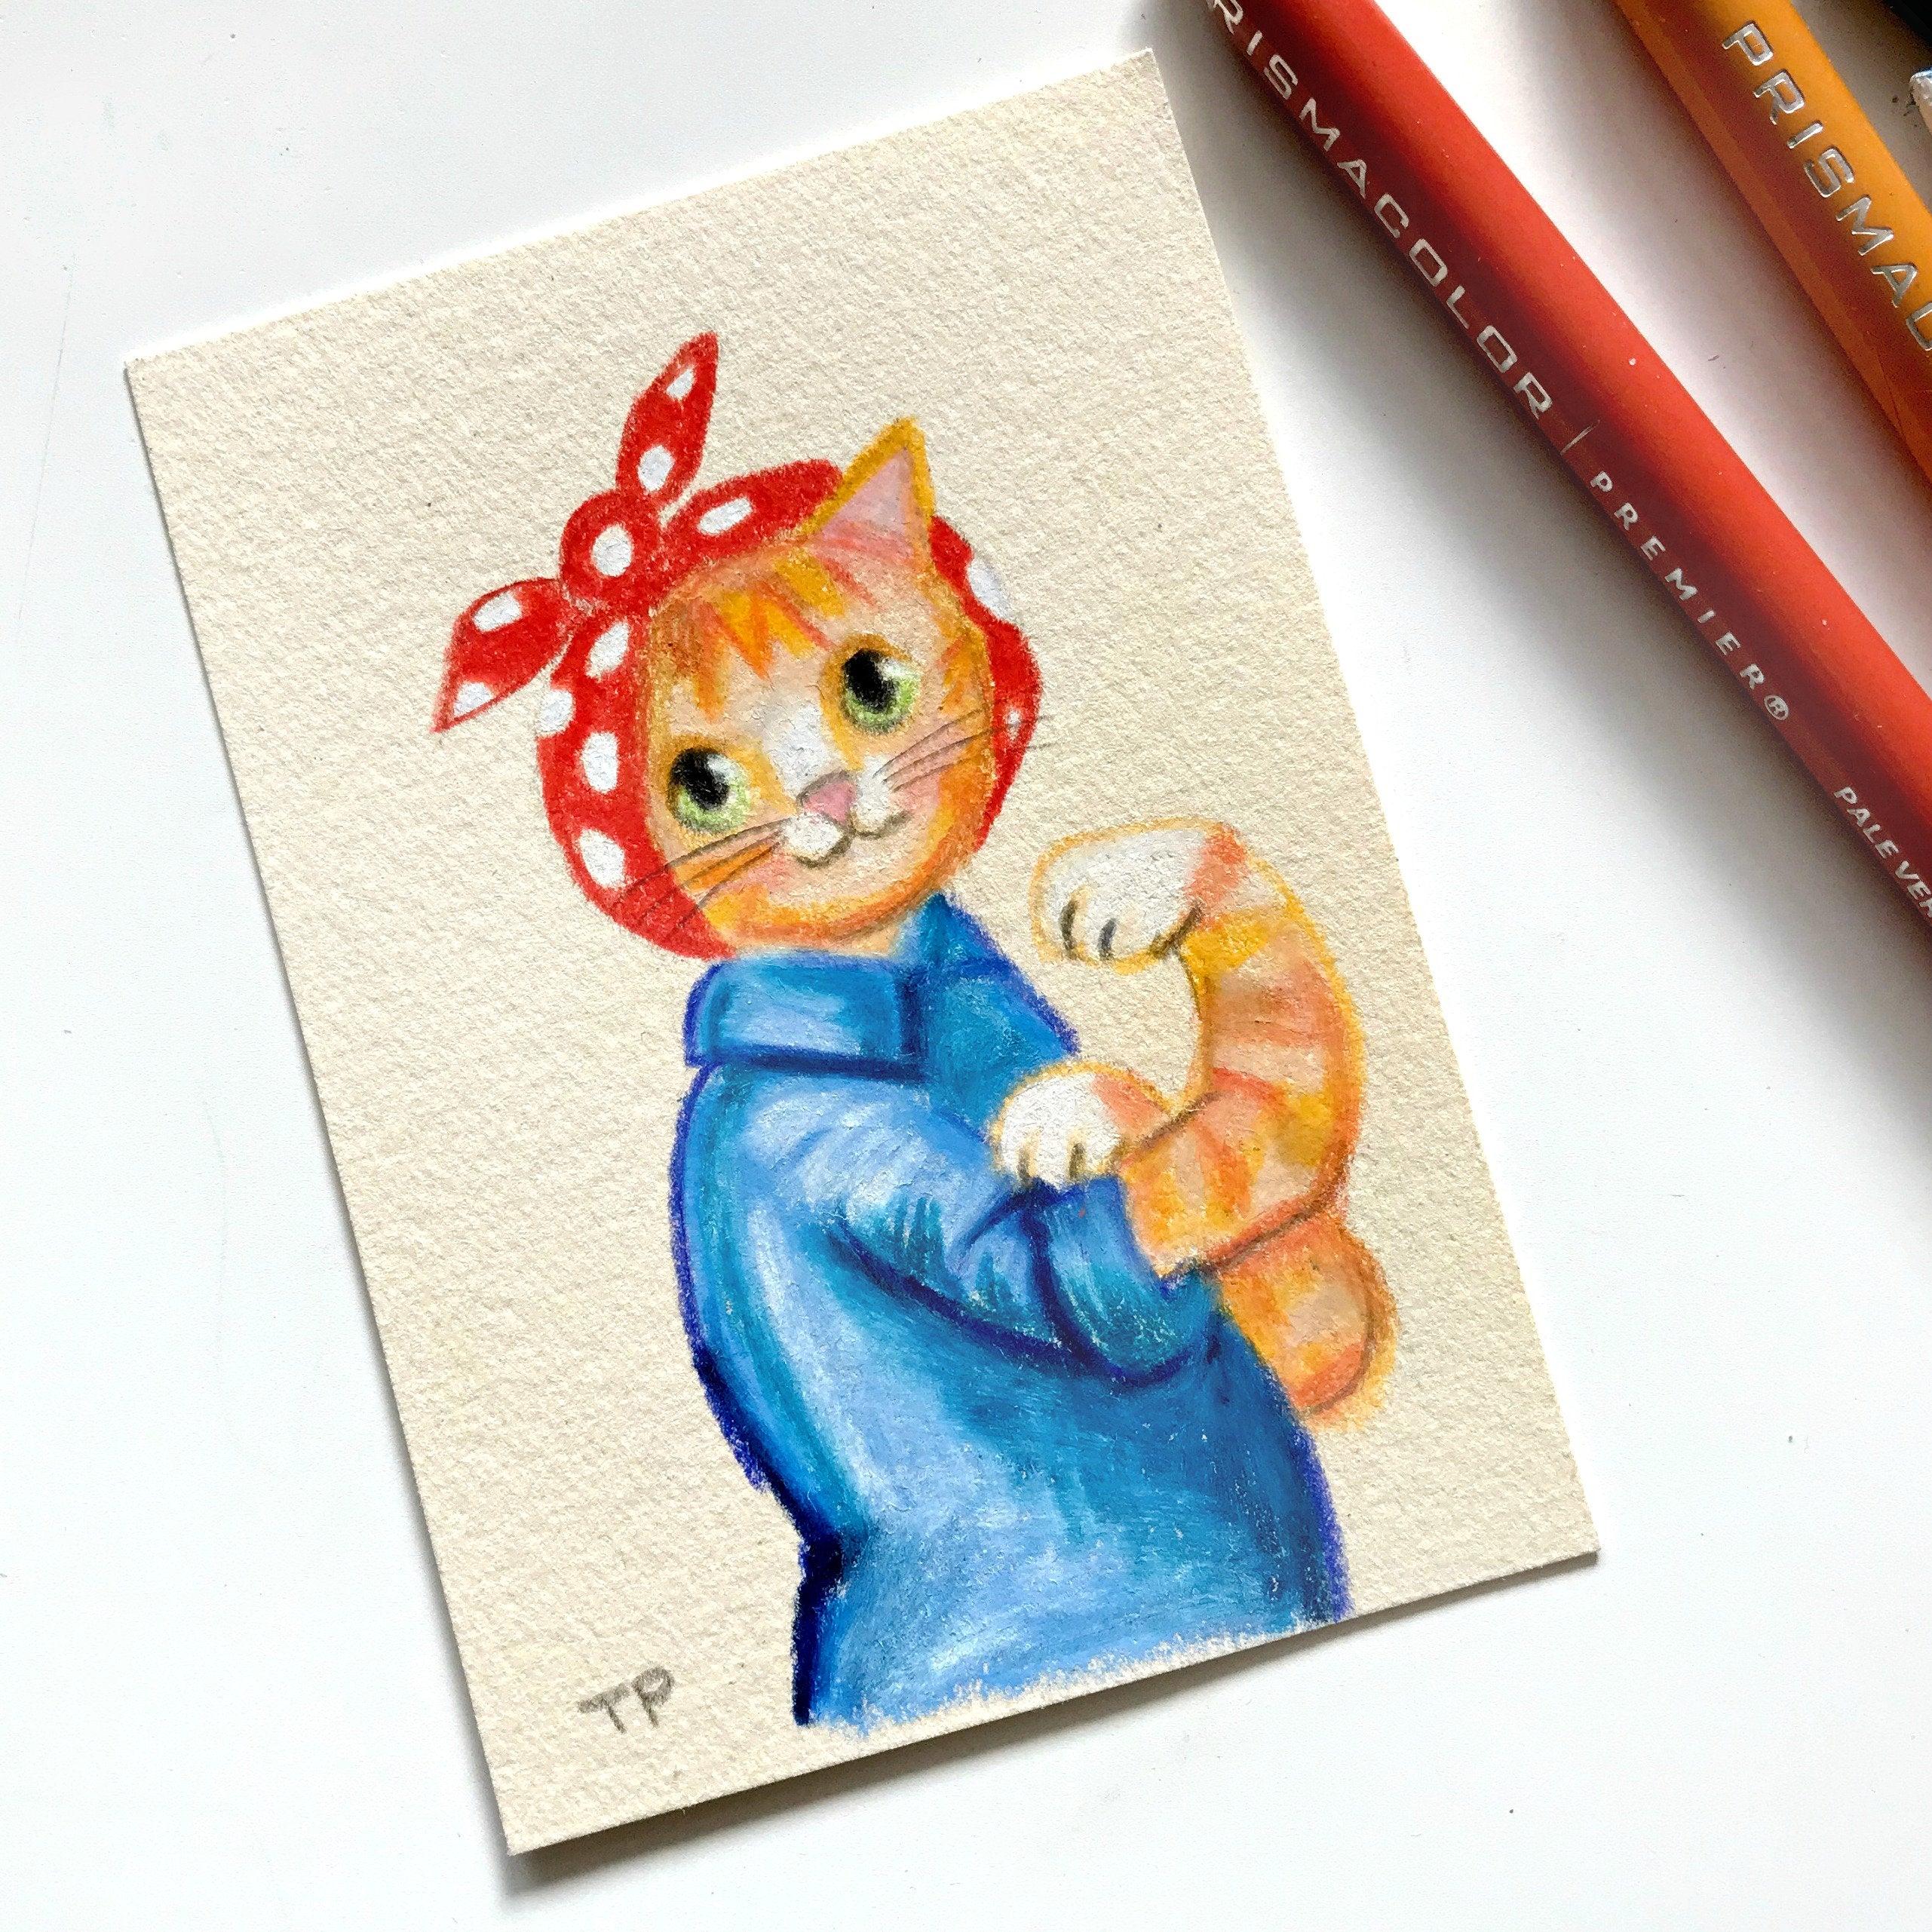 2562x2562 Original We Can Do It Orange Tabby Cat Drawing Cat Empowerment Etsy